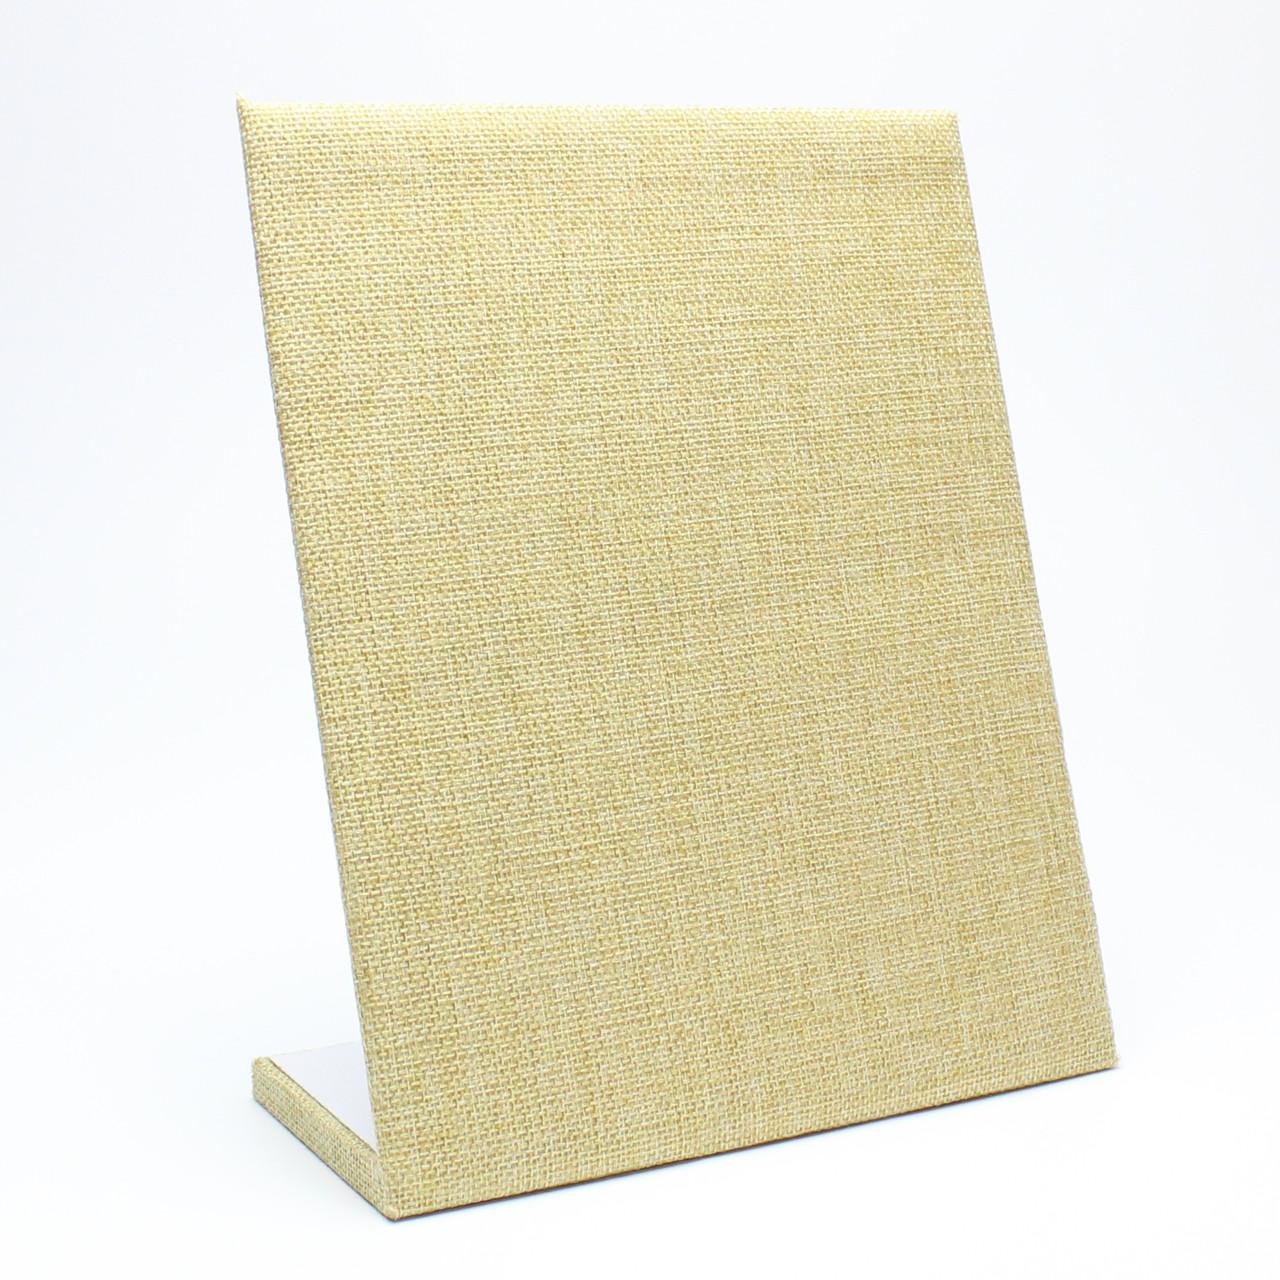 Подставка L для пусетов плетенка